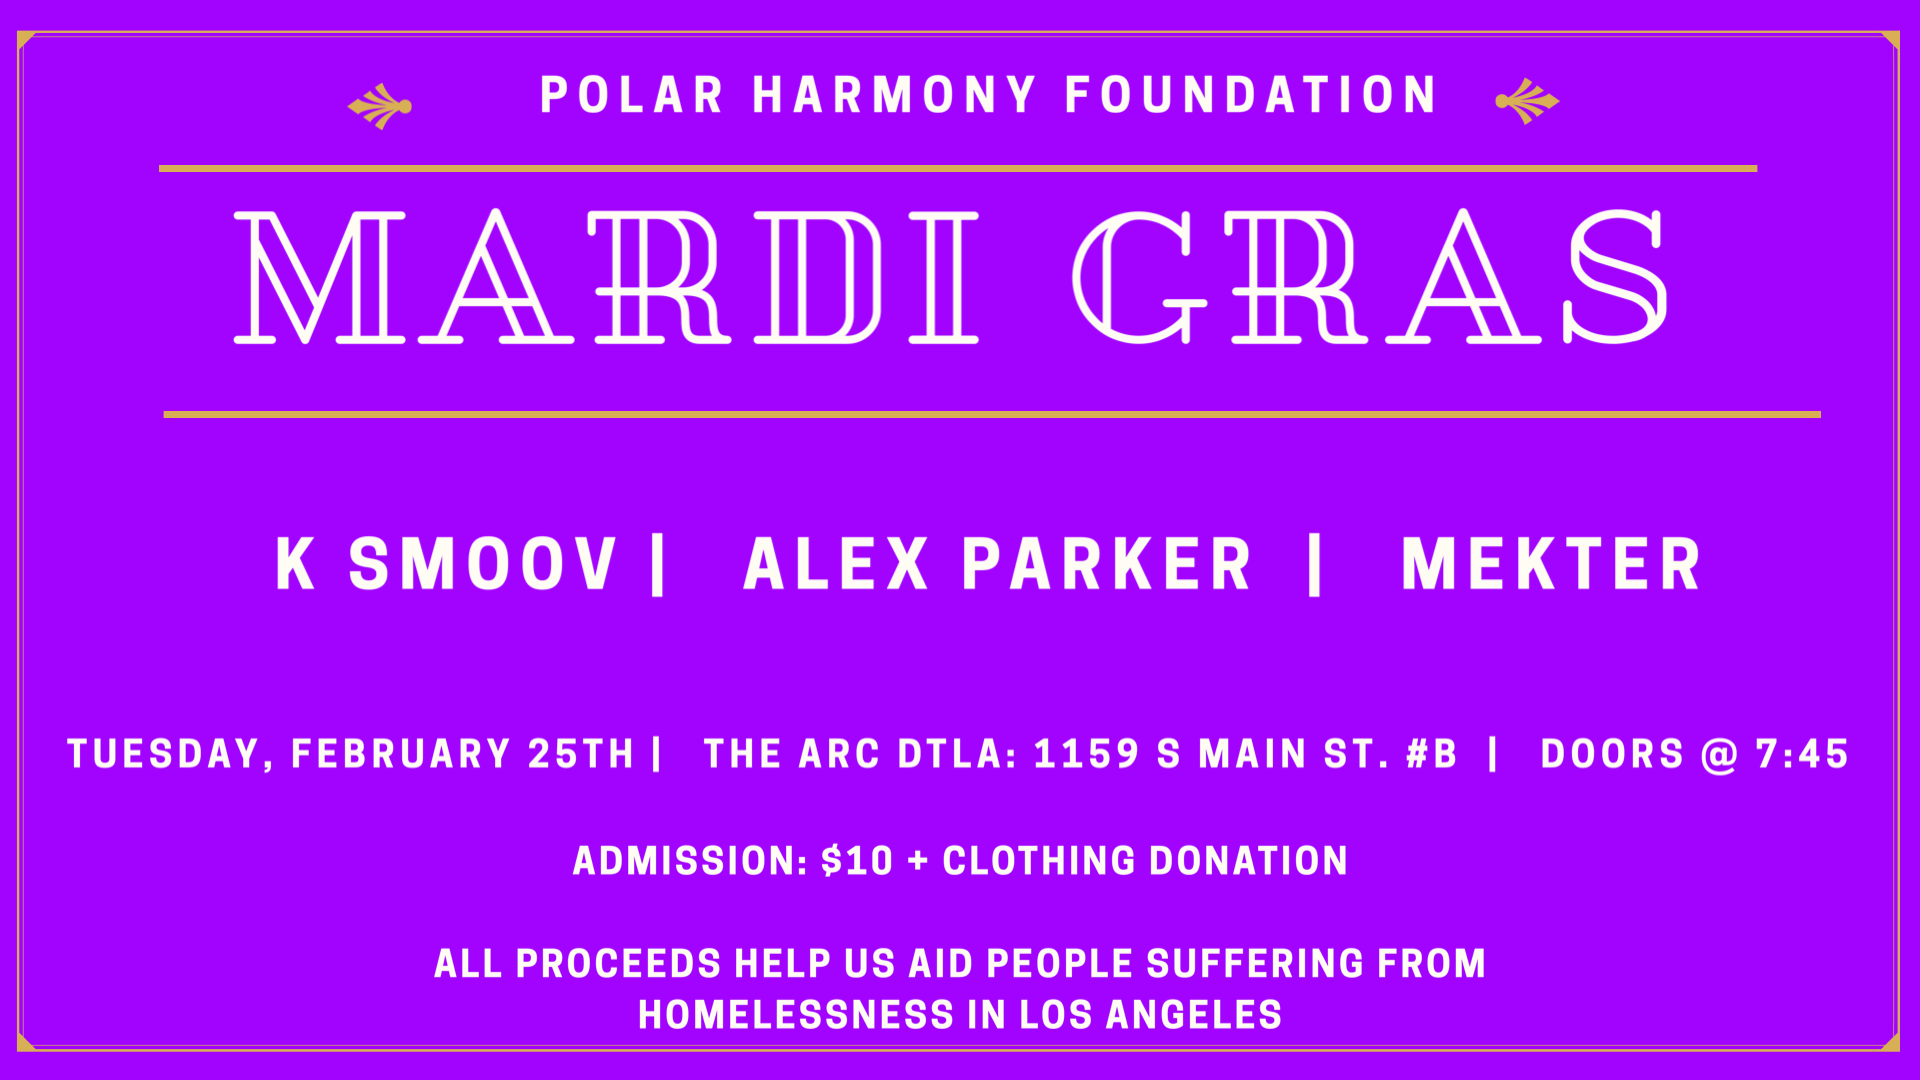 Polar Harmony Foundation: Mardi Gras Party